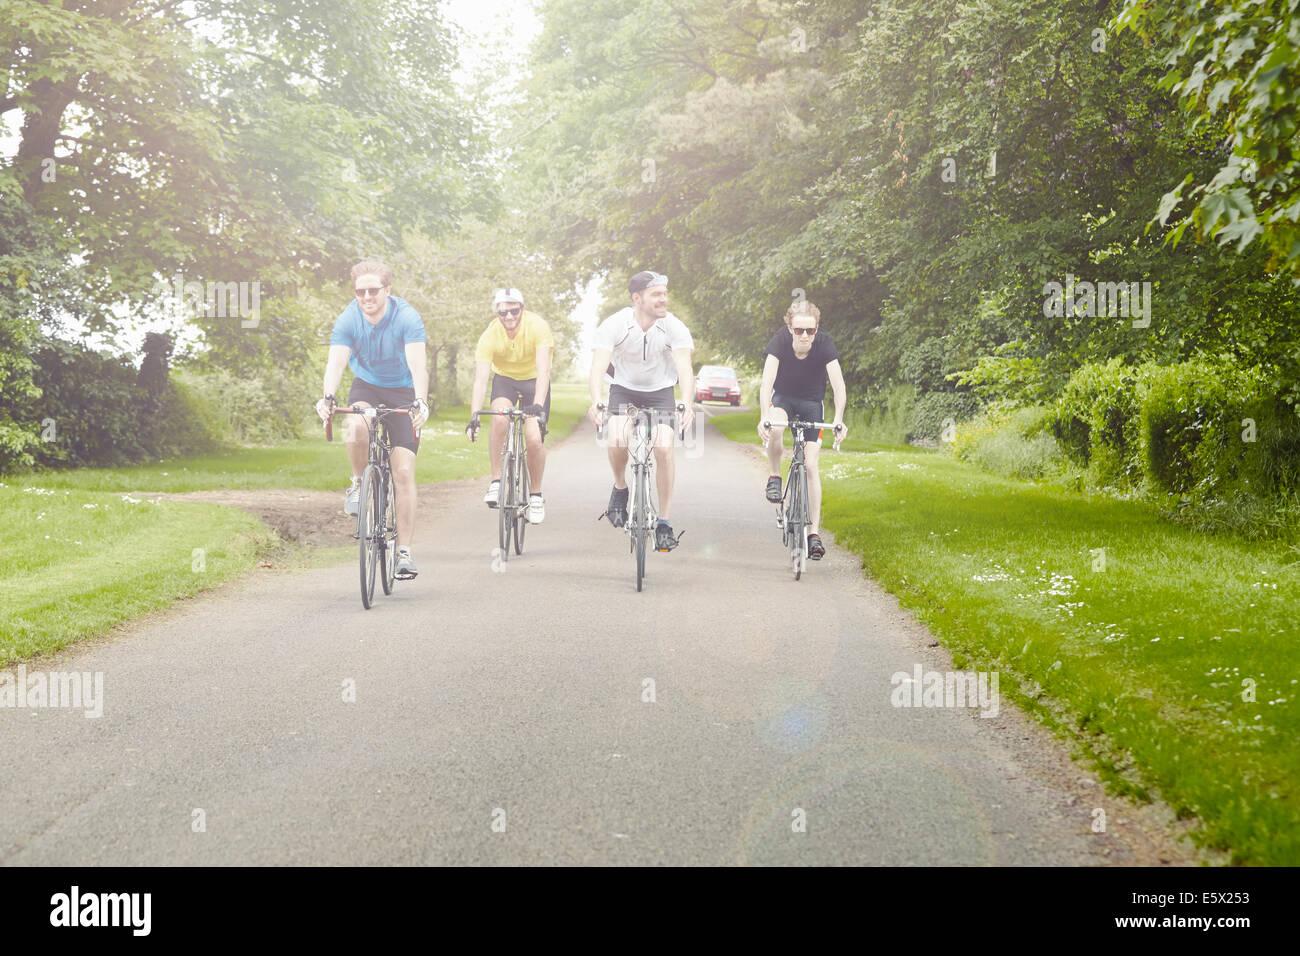 Radfahrer fahren auf grünen Landschaft Straße, Cotswolds, UK Stockbild